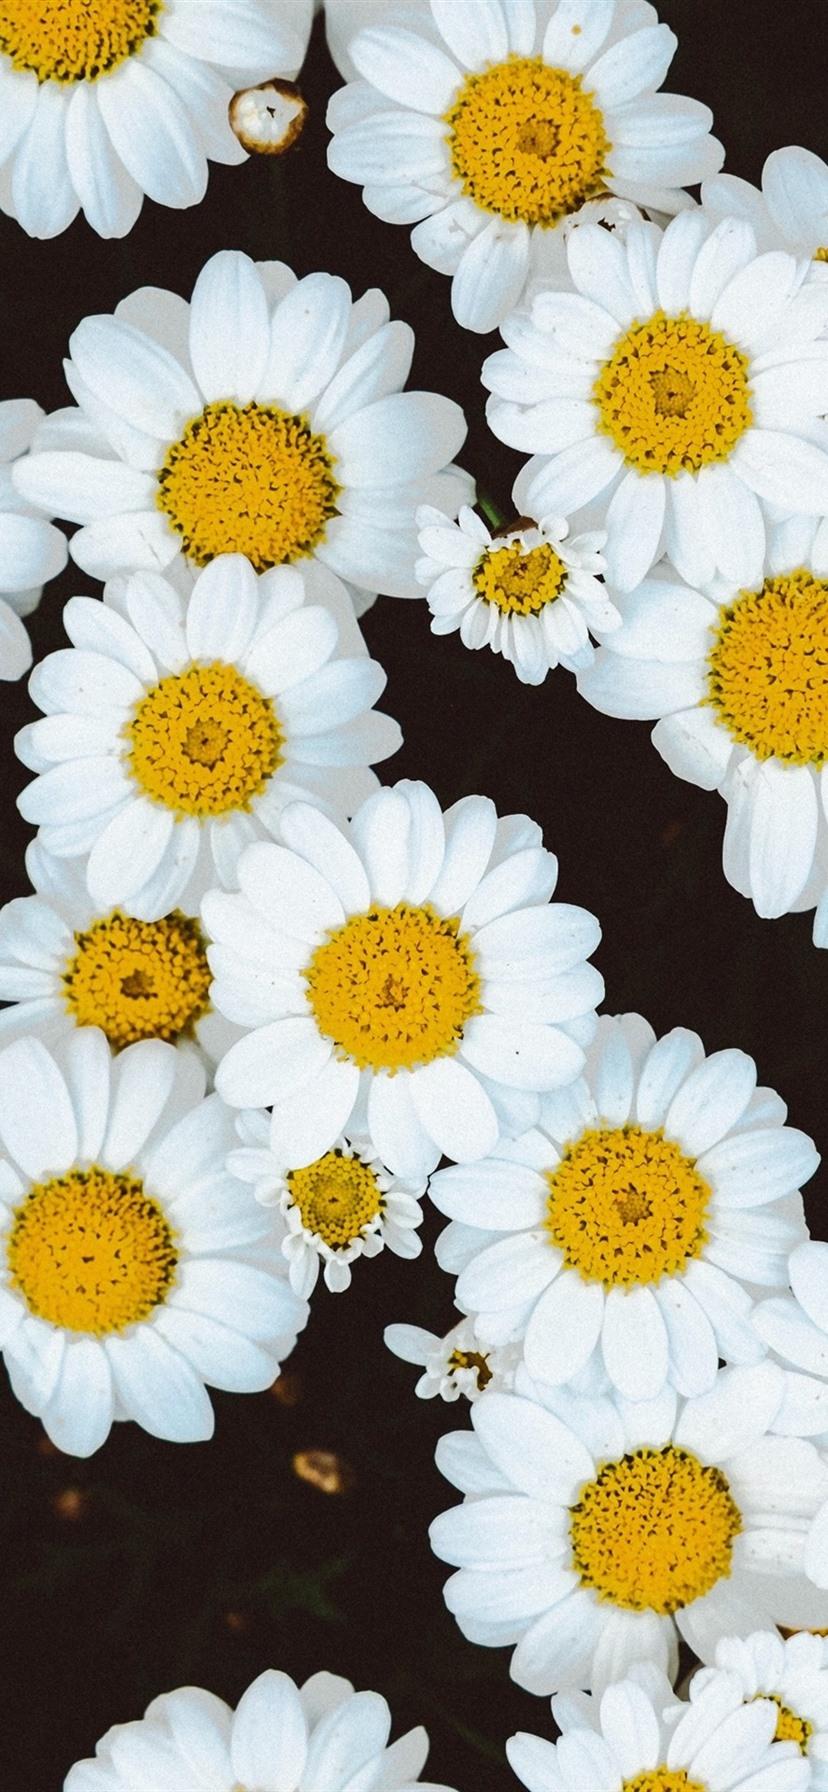 Wallpaper White Daisies Flowers Background 3840x2160 Uhd